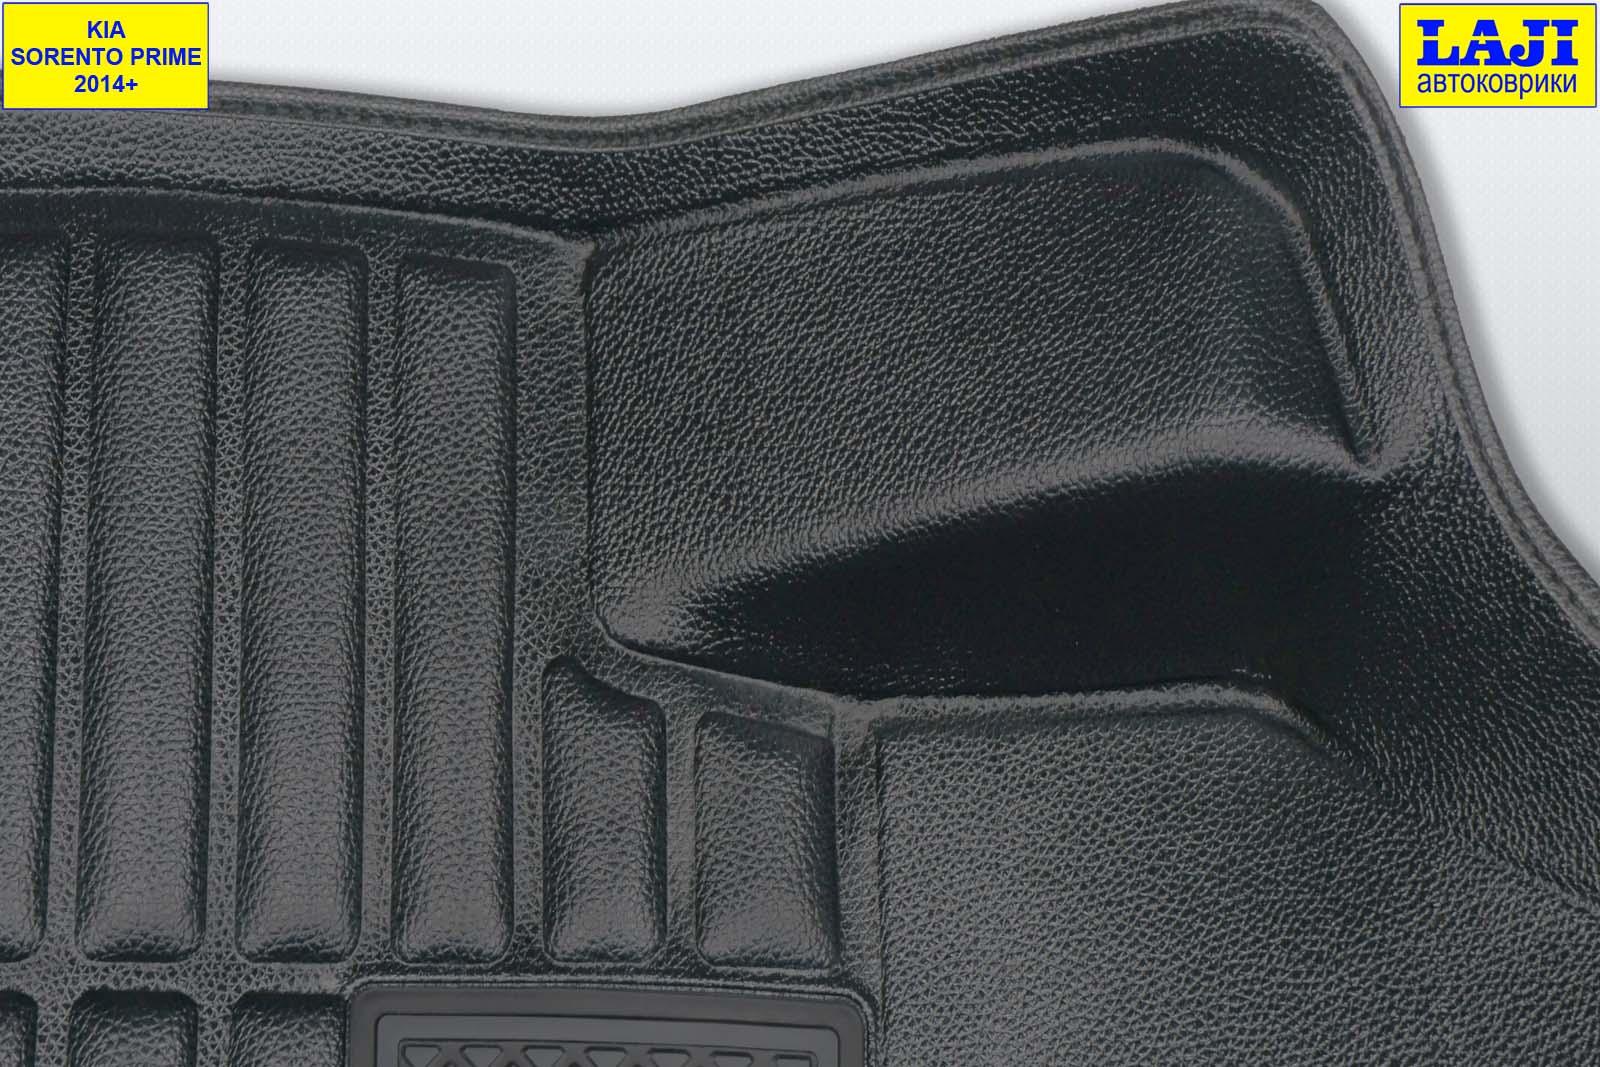 5D коврики в салон KIA Sorento Prime UM 2014-2020 6